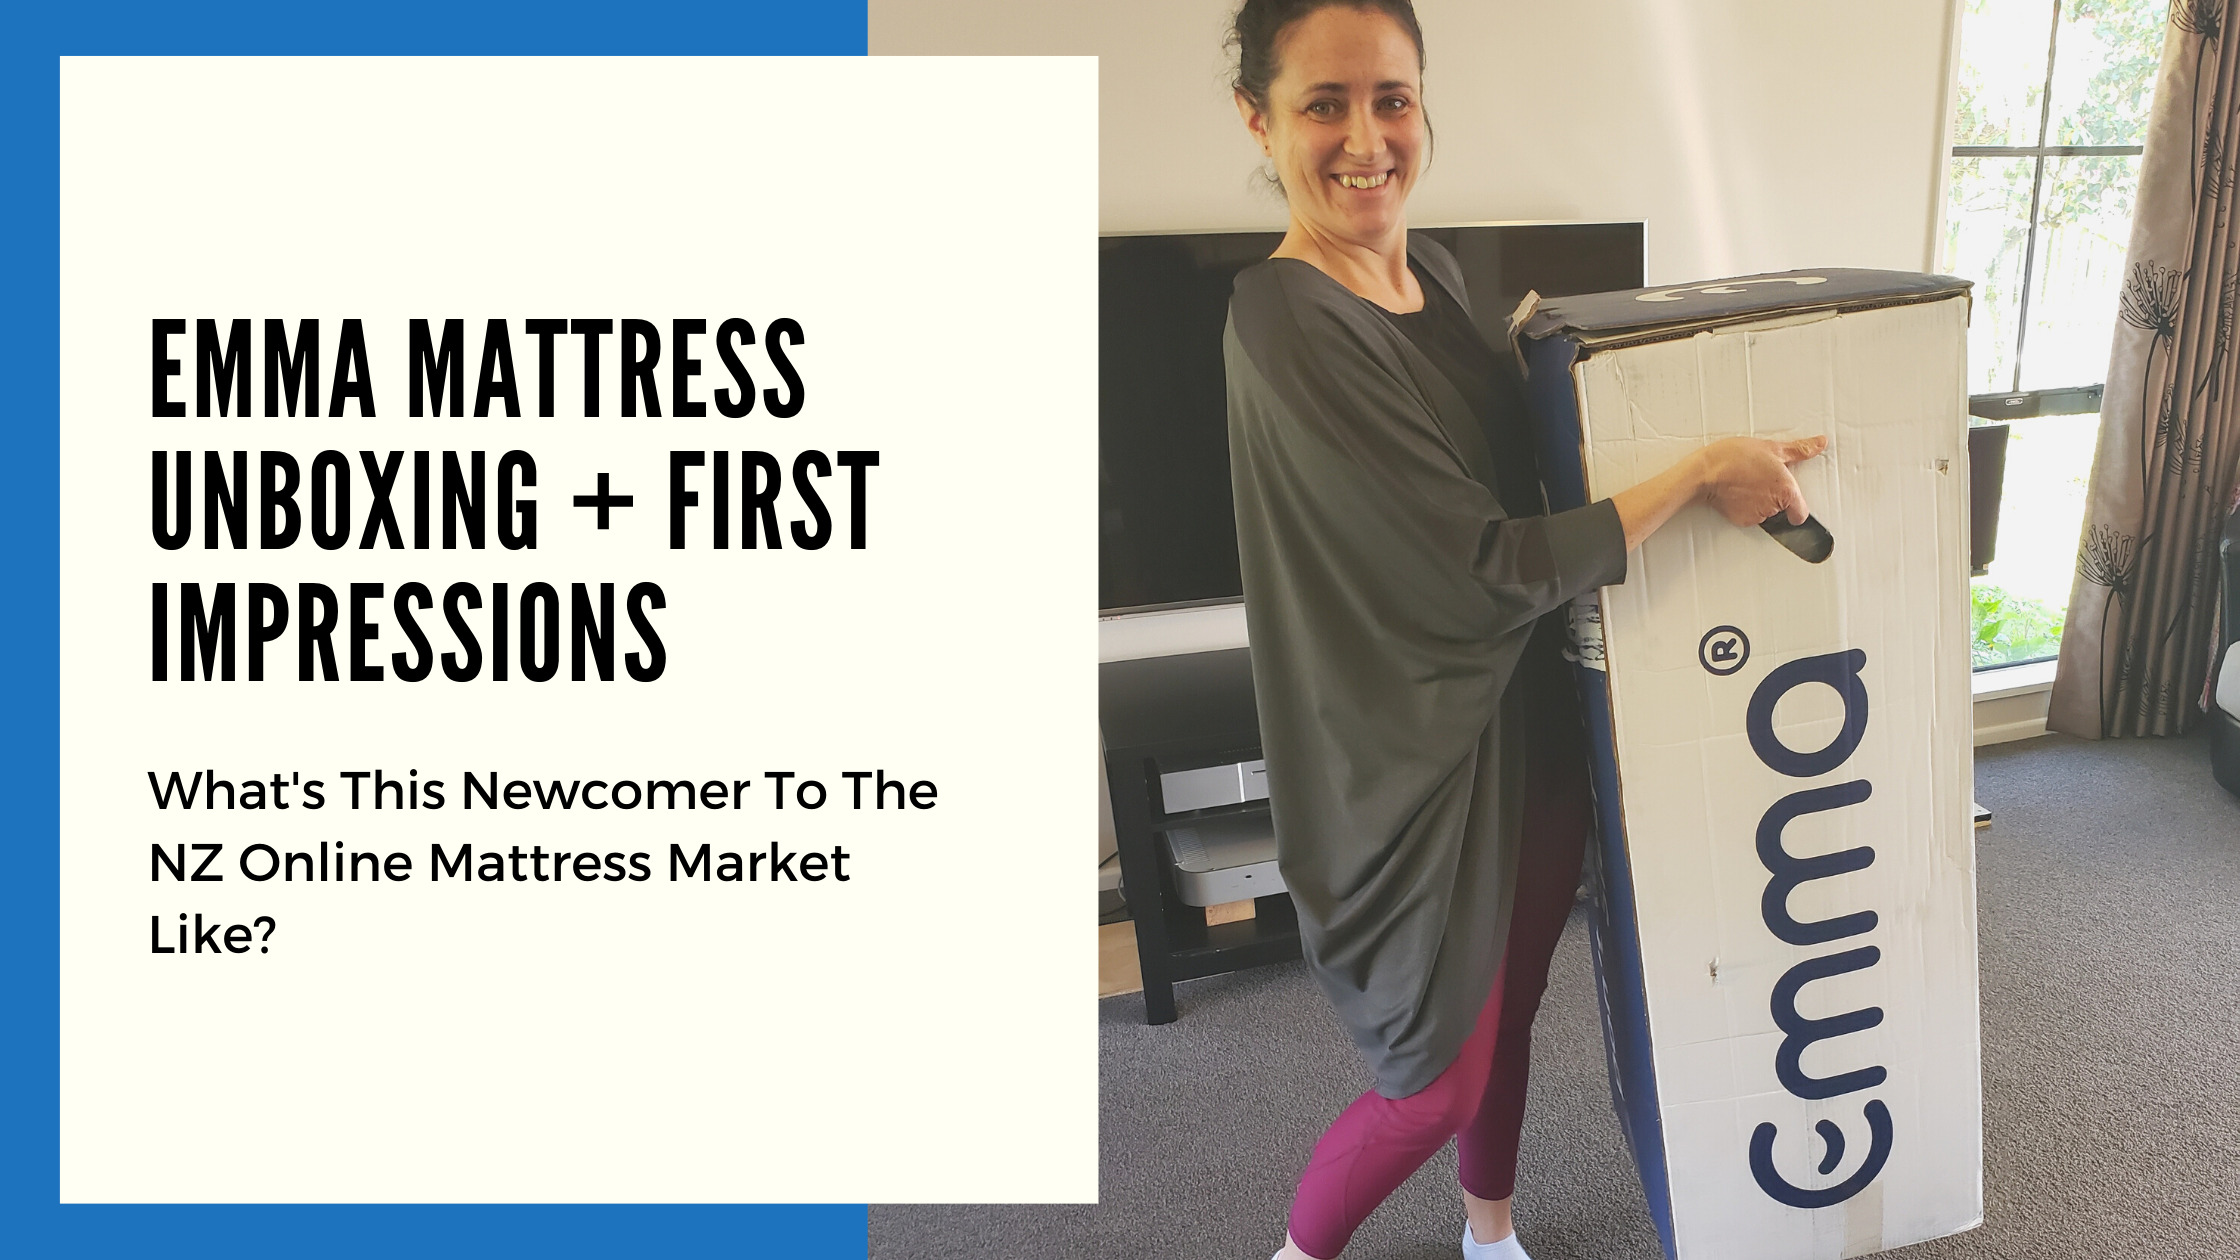 Emma Mattress Unboxing + First Impressions